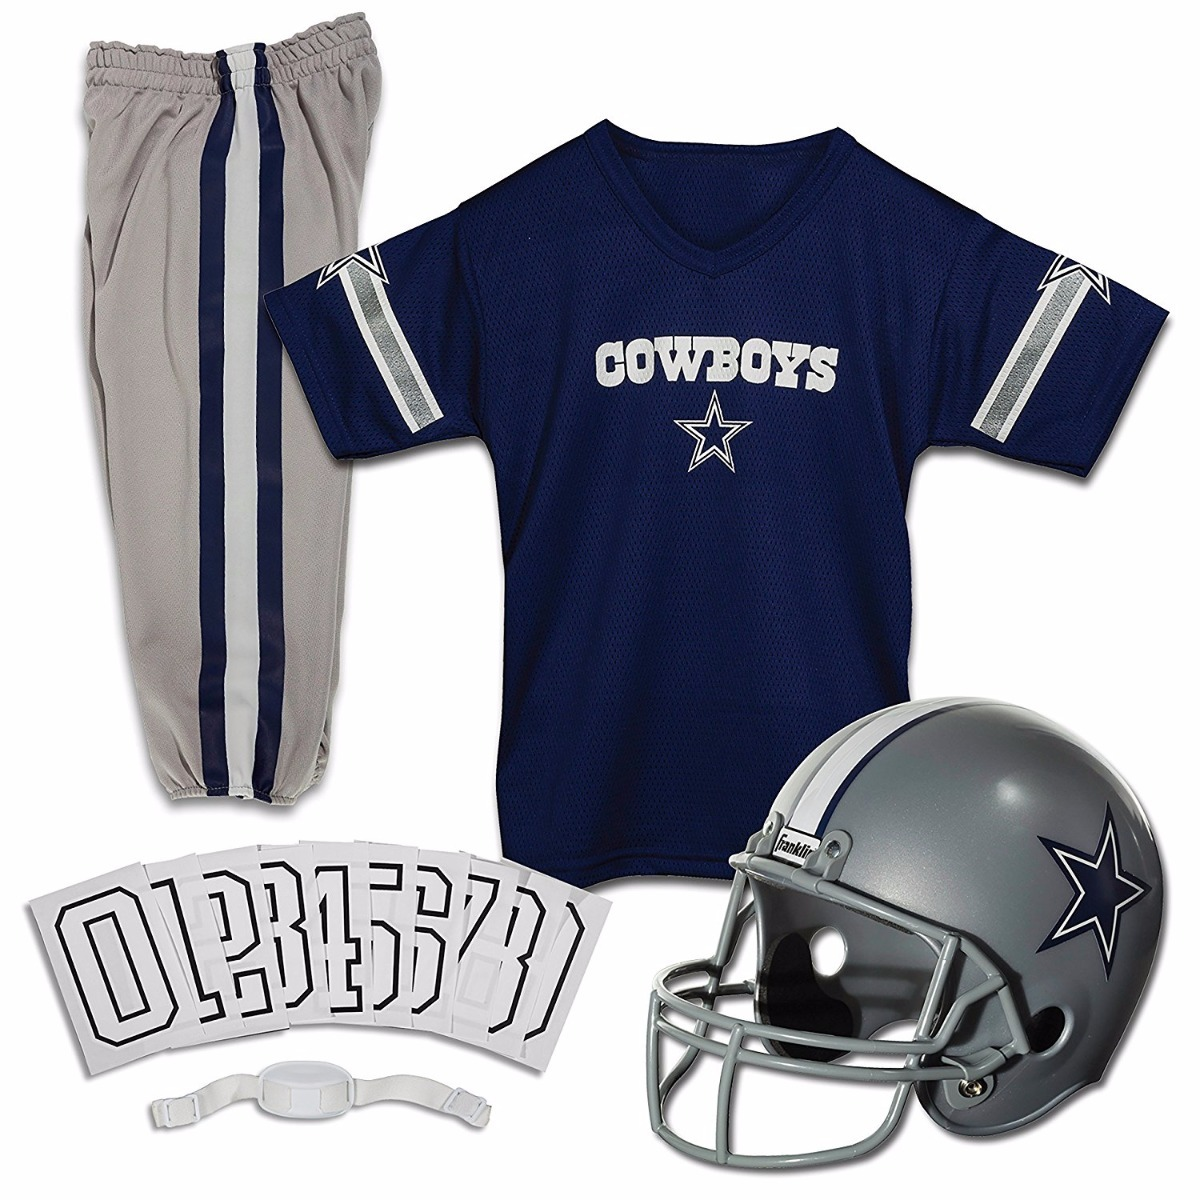 12bd45c23be37 Nfl Dallas Cowboys Jersey Uniforme Niño-niña -   650.00 en Mercado Libre